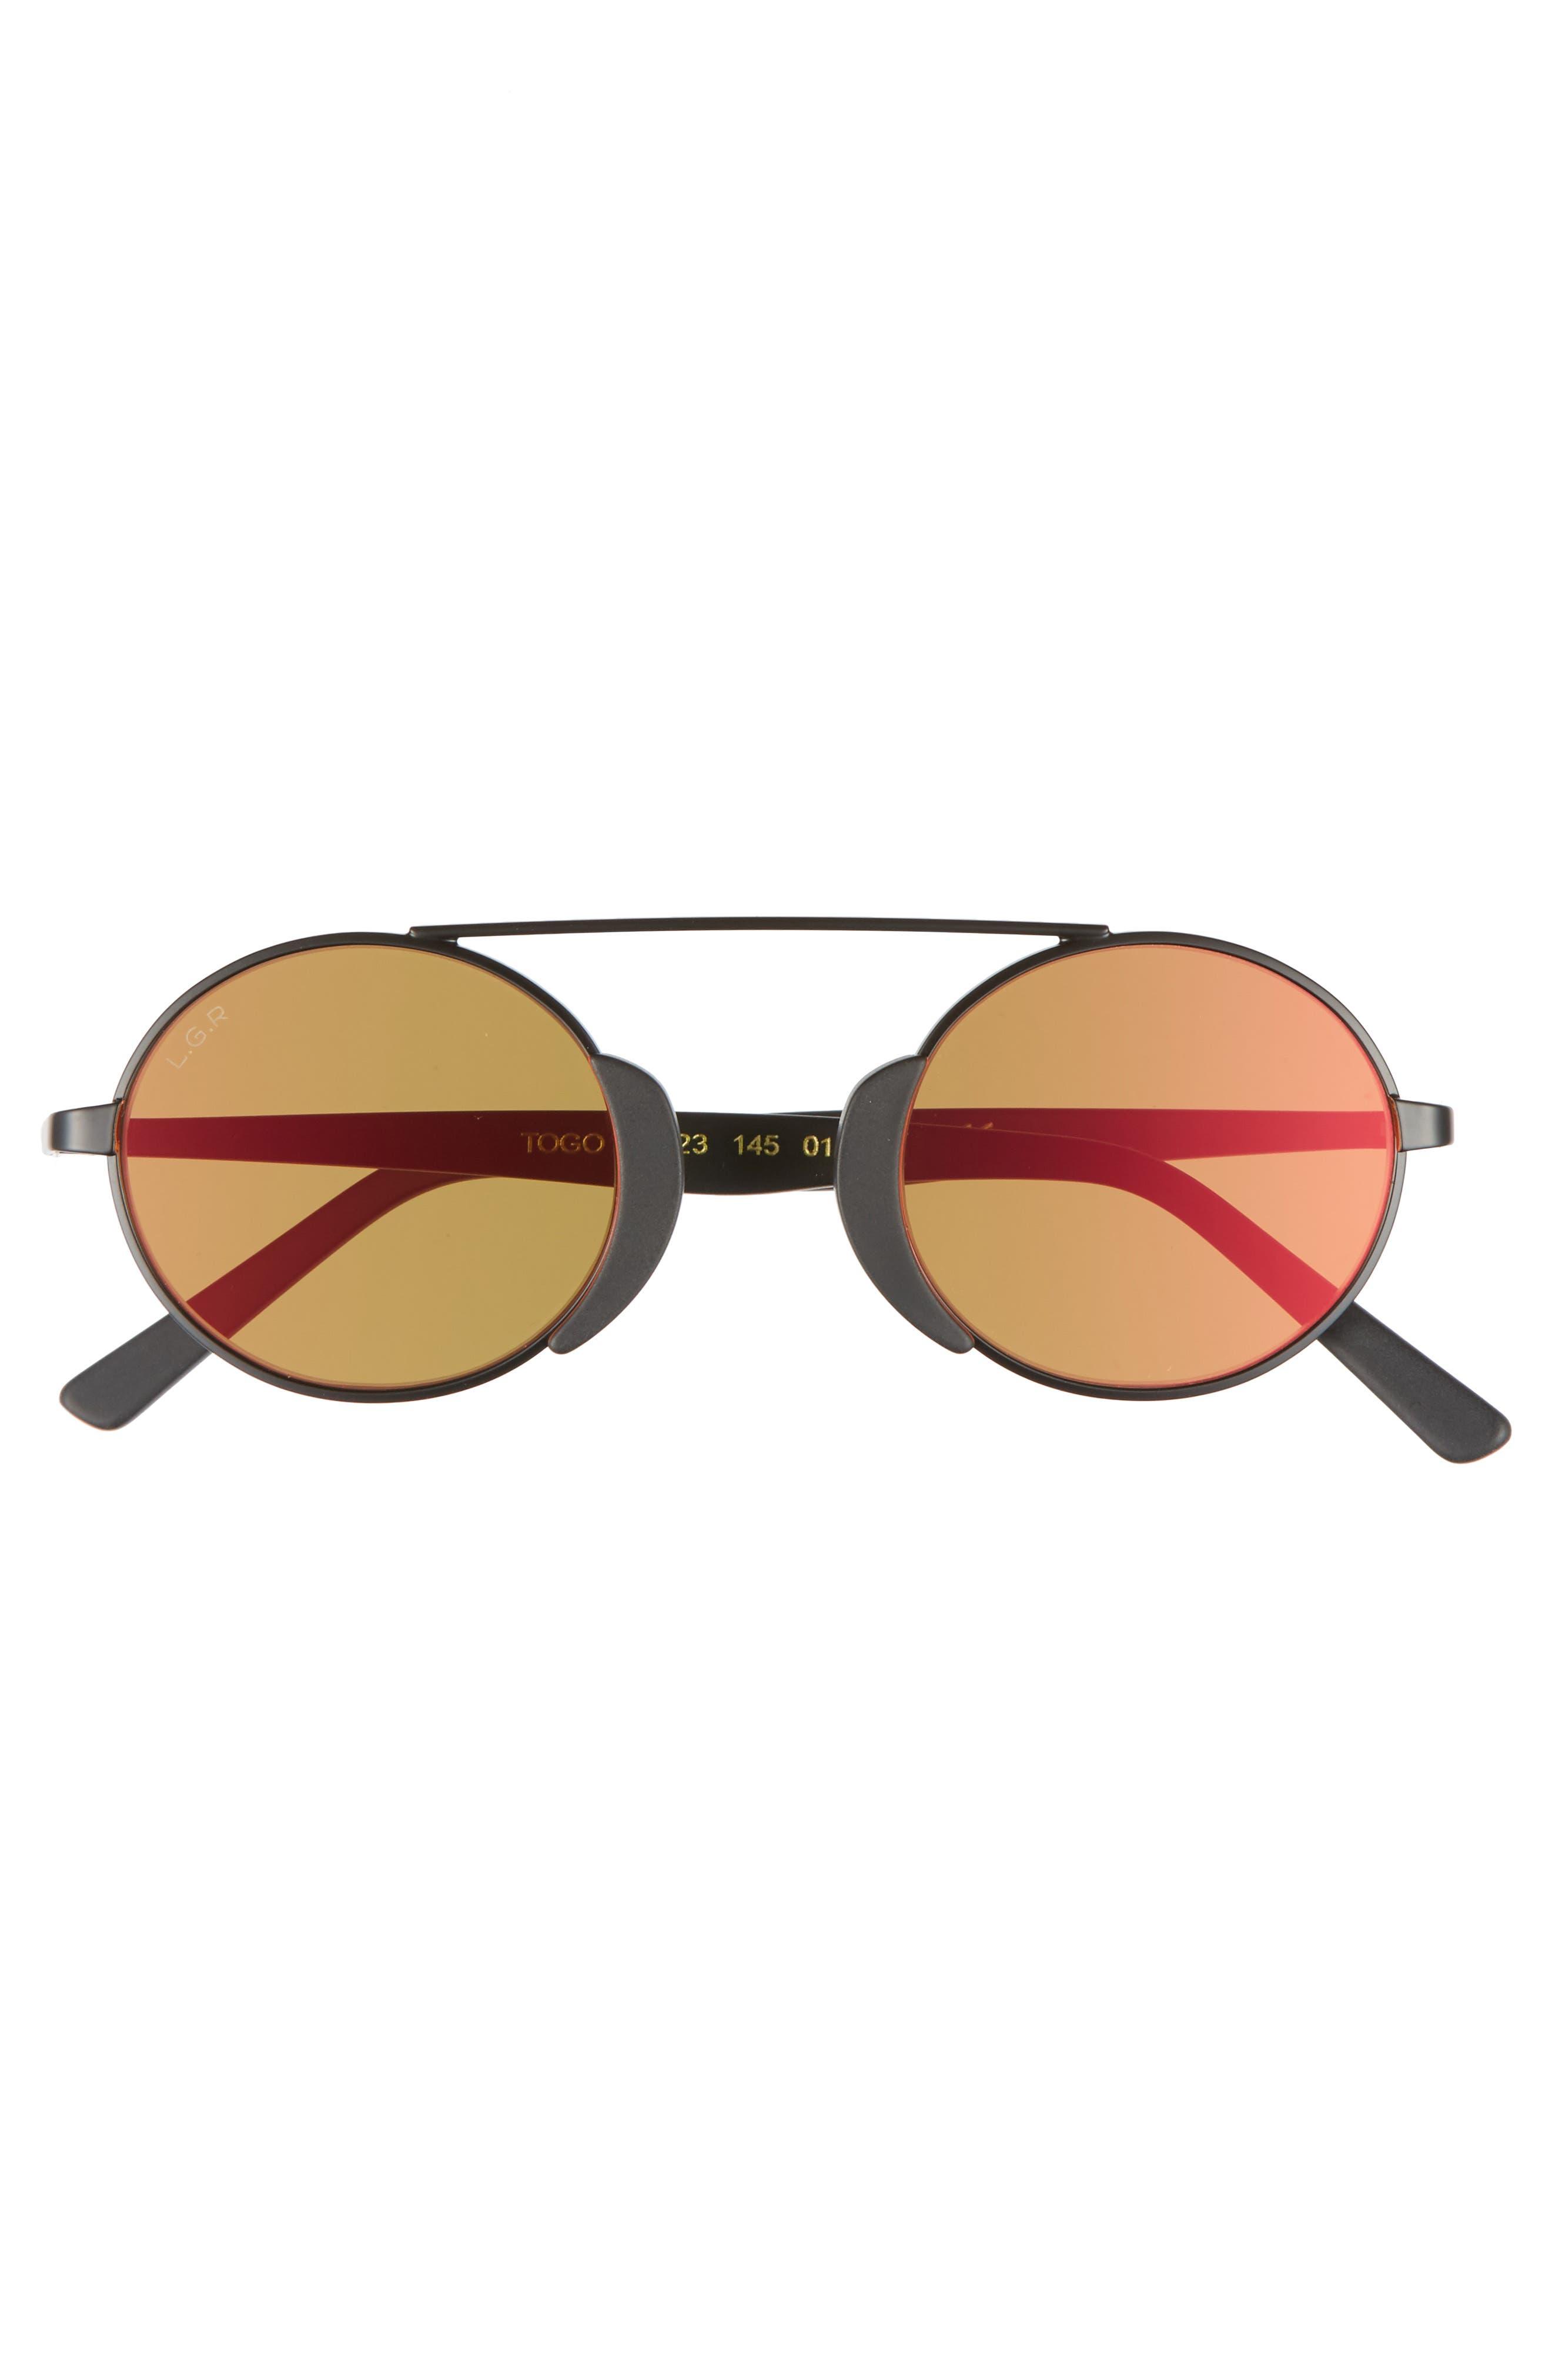 Togo 48mm Sunglasses,                             Alternate thumbnail 2, color,                             001